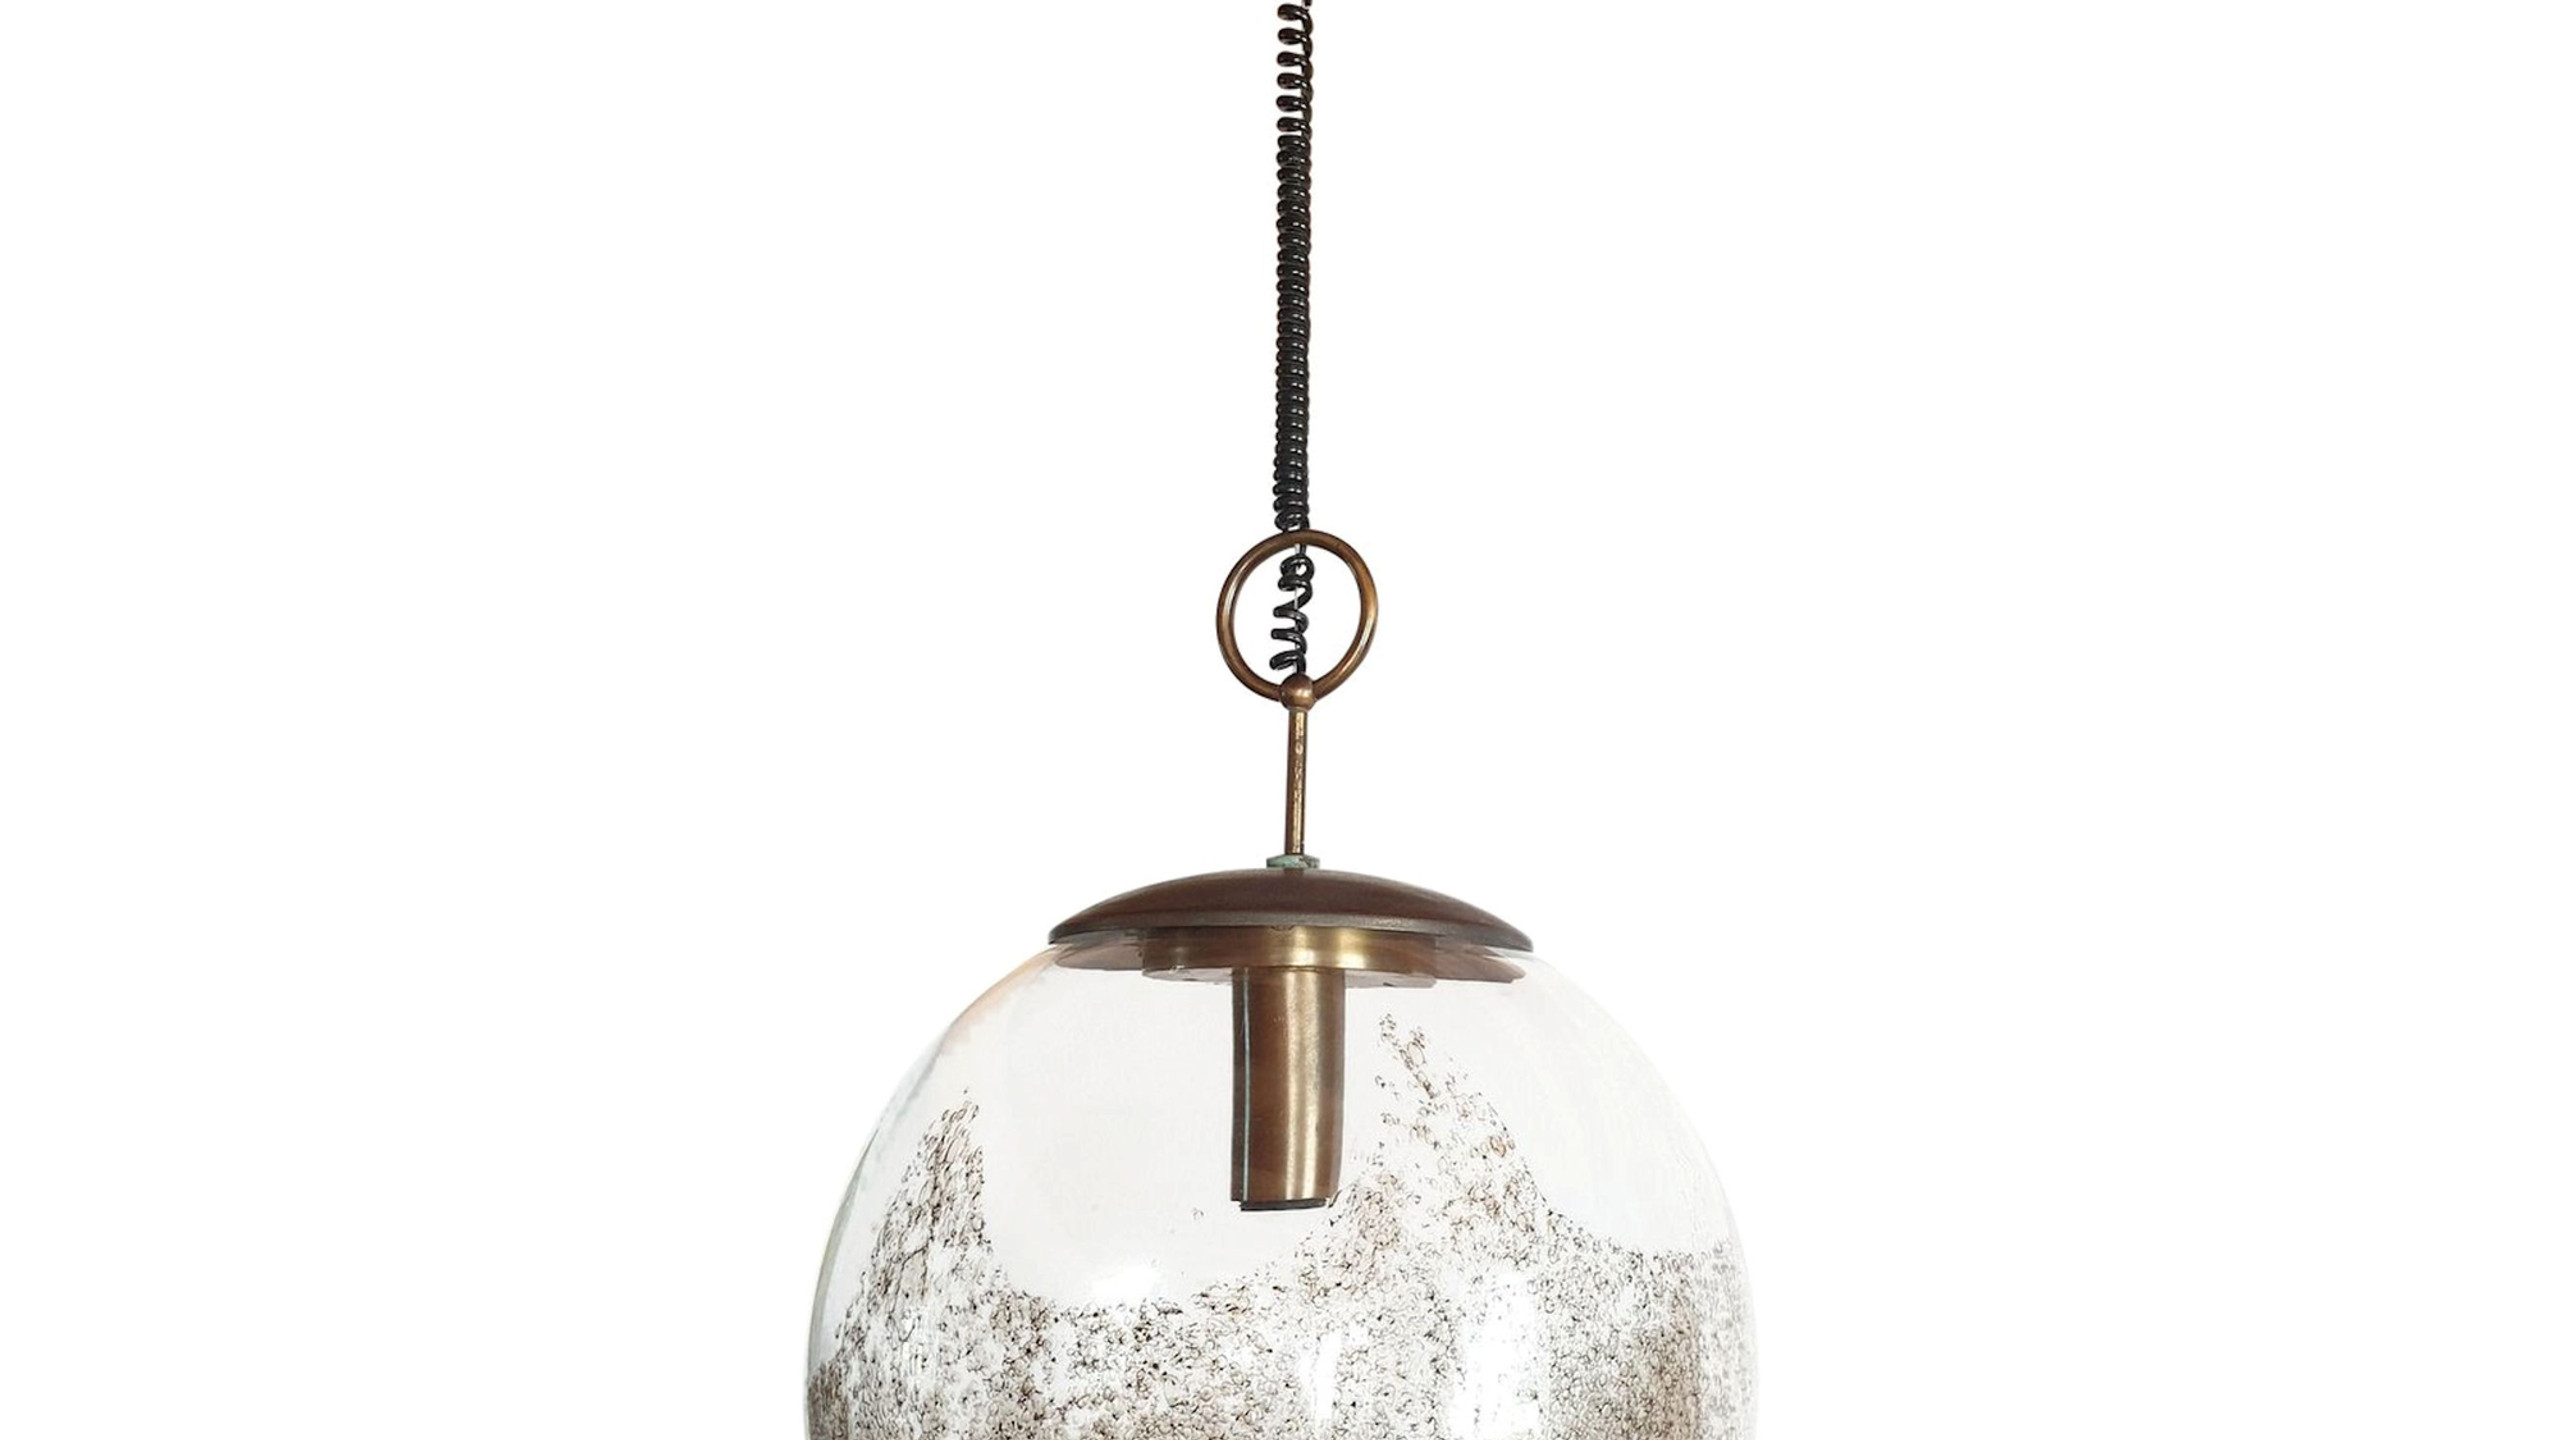 Large Murano glass globe light, Mid Century Modern, by Carlo Nason for Mazzega, Italy 1960s